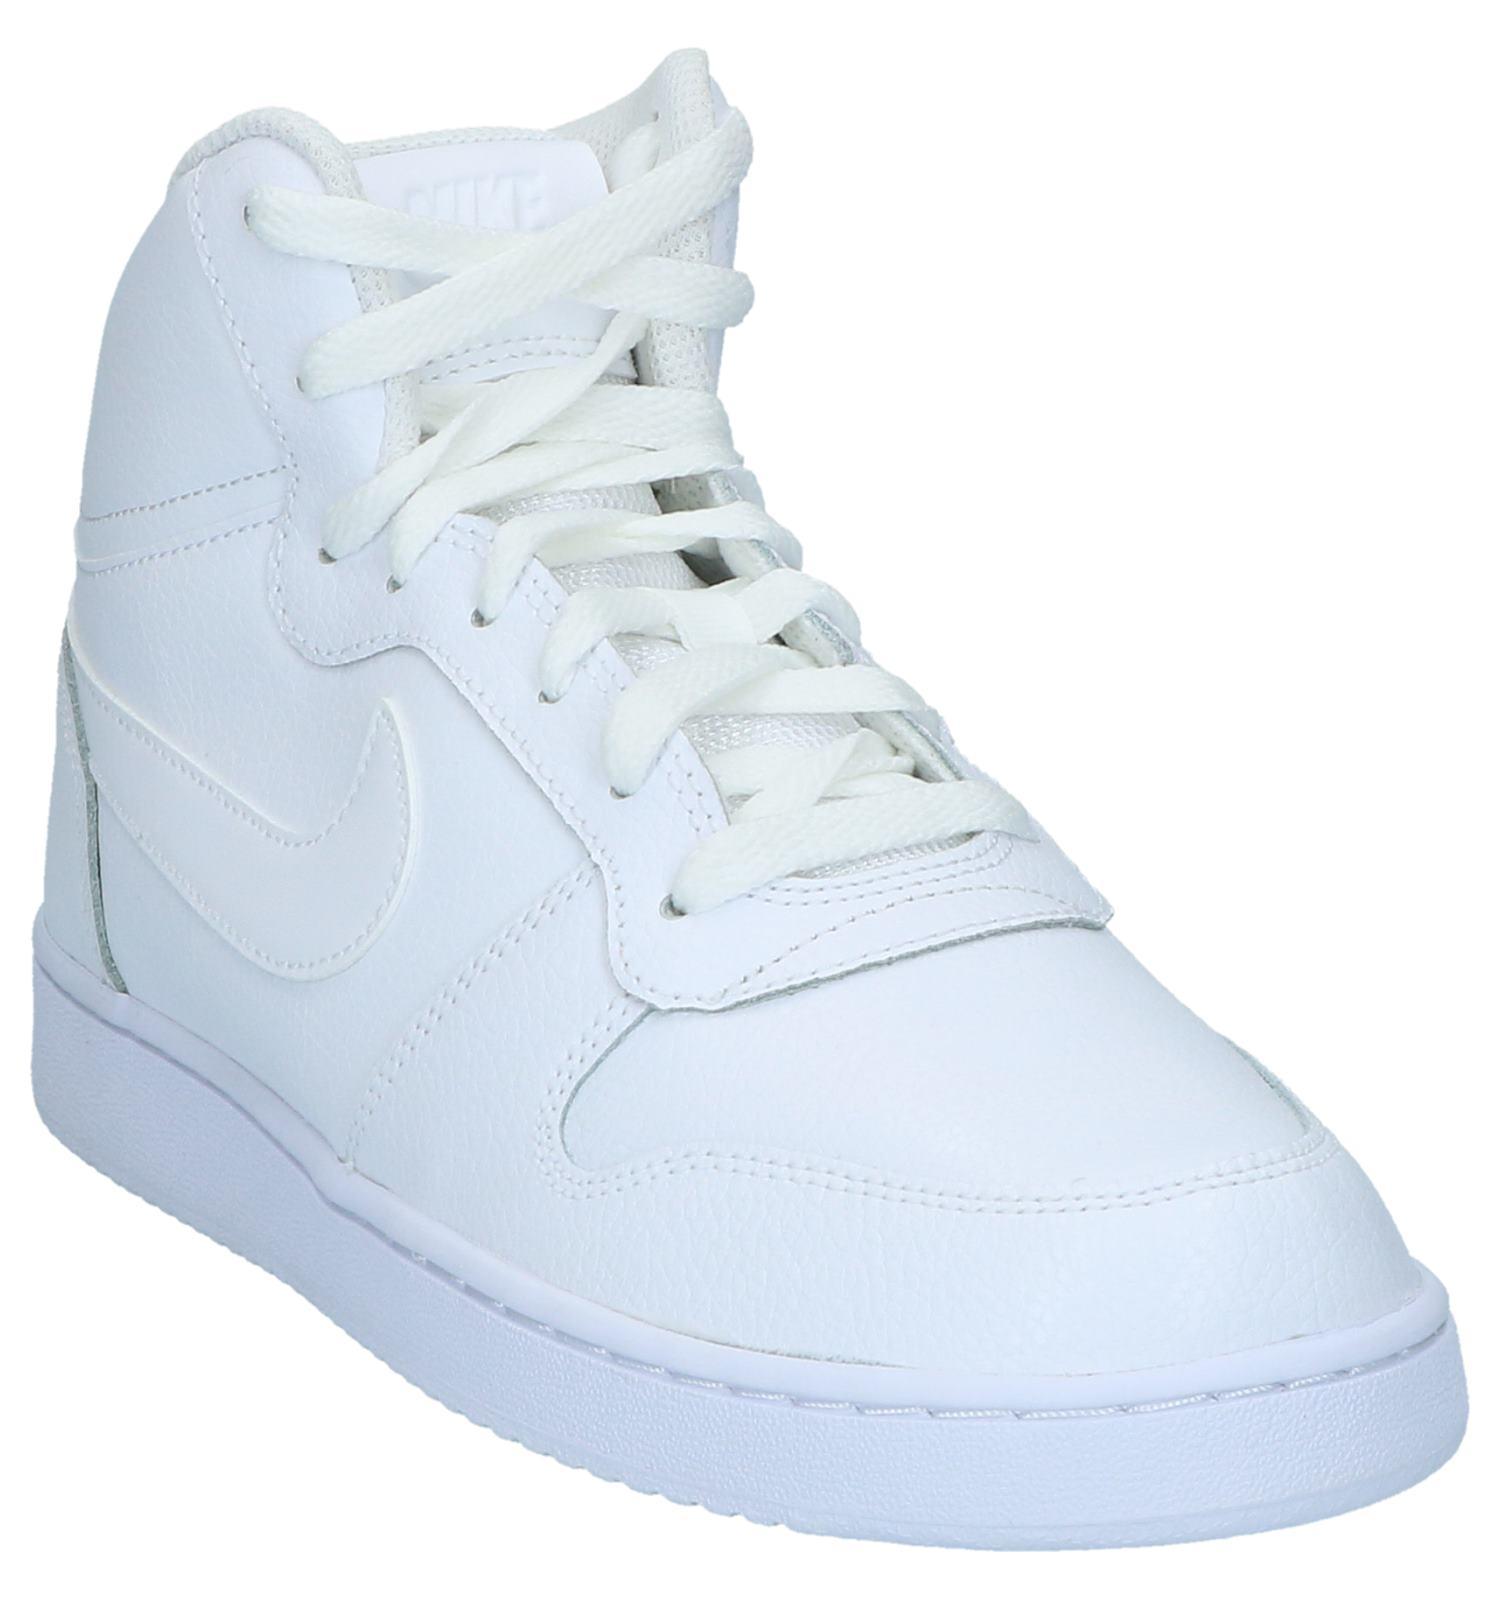 Ebernon Witte Nike Nike Sneakers Hoge Ebernon Witte Hoge mvgyIYbf76